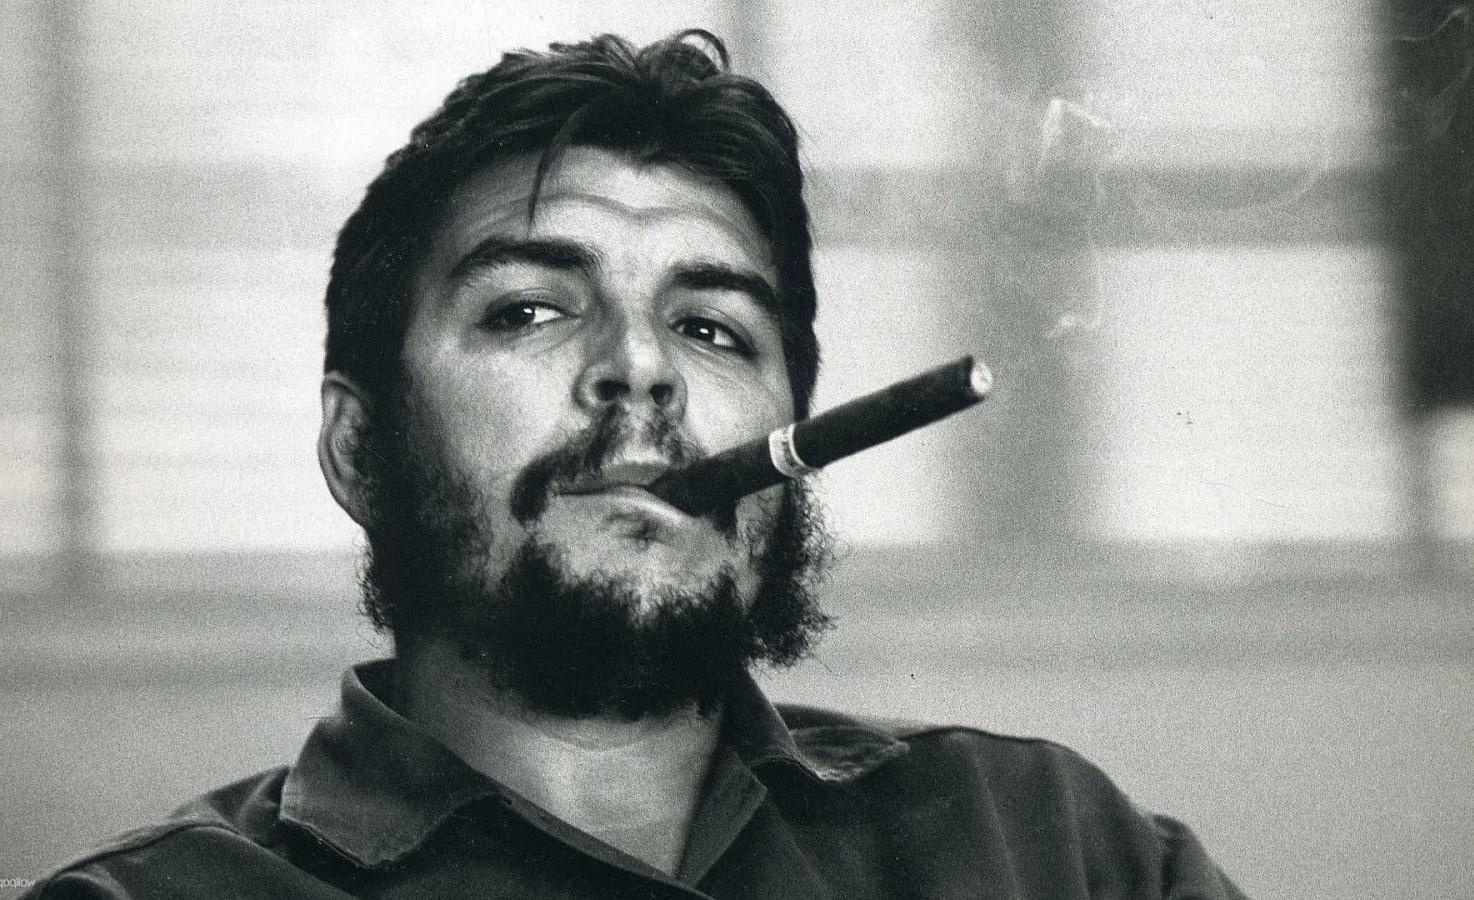 10 School Administrator Interview Questions And Answers Che Guevara Fotos Del Che Guevara Comandante Che Guevara